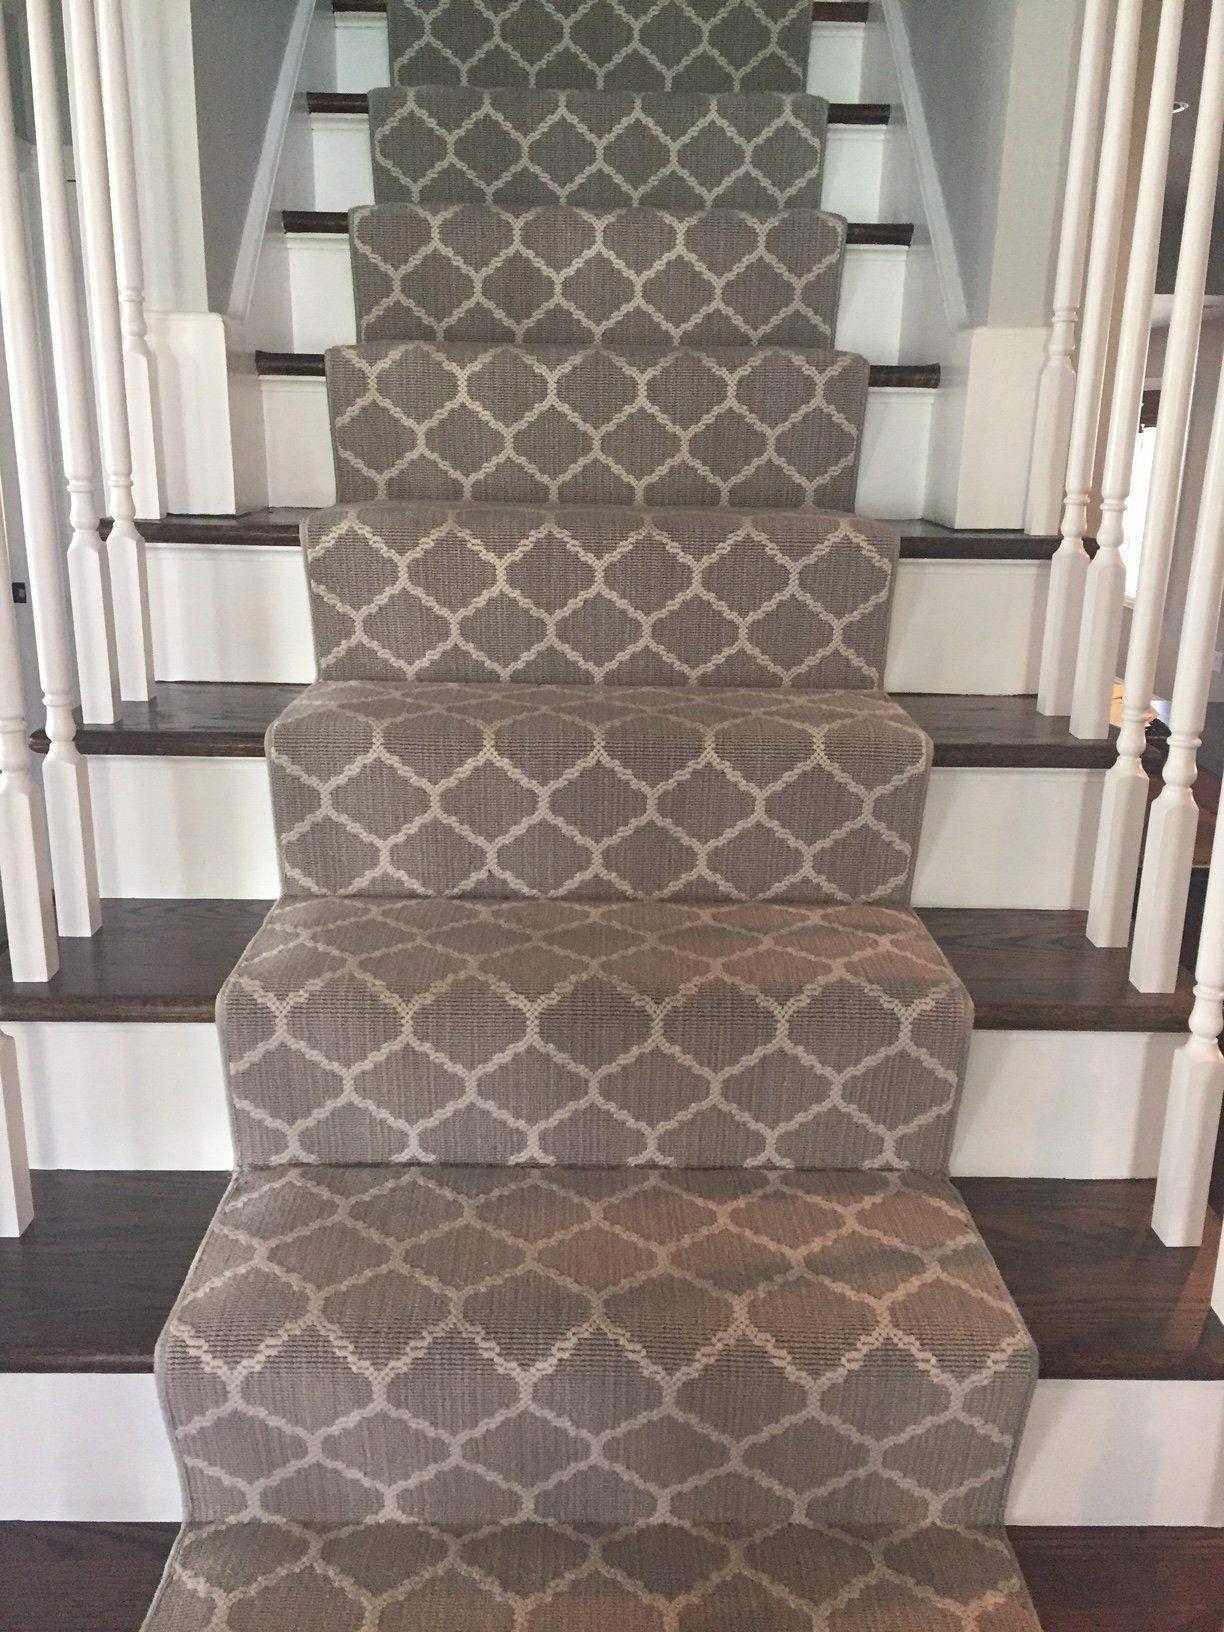 Carpet Runners By The Foot Lowes Paddingforcarpetrunners Product   Lowes Carpet Runners By The Foot   Persian Carpet   Beige Carpet   Heriz Rug   Kilim Rugs   Stairs